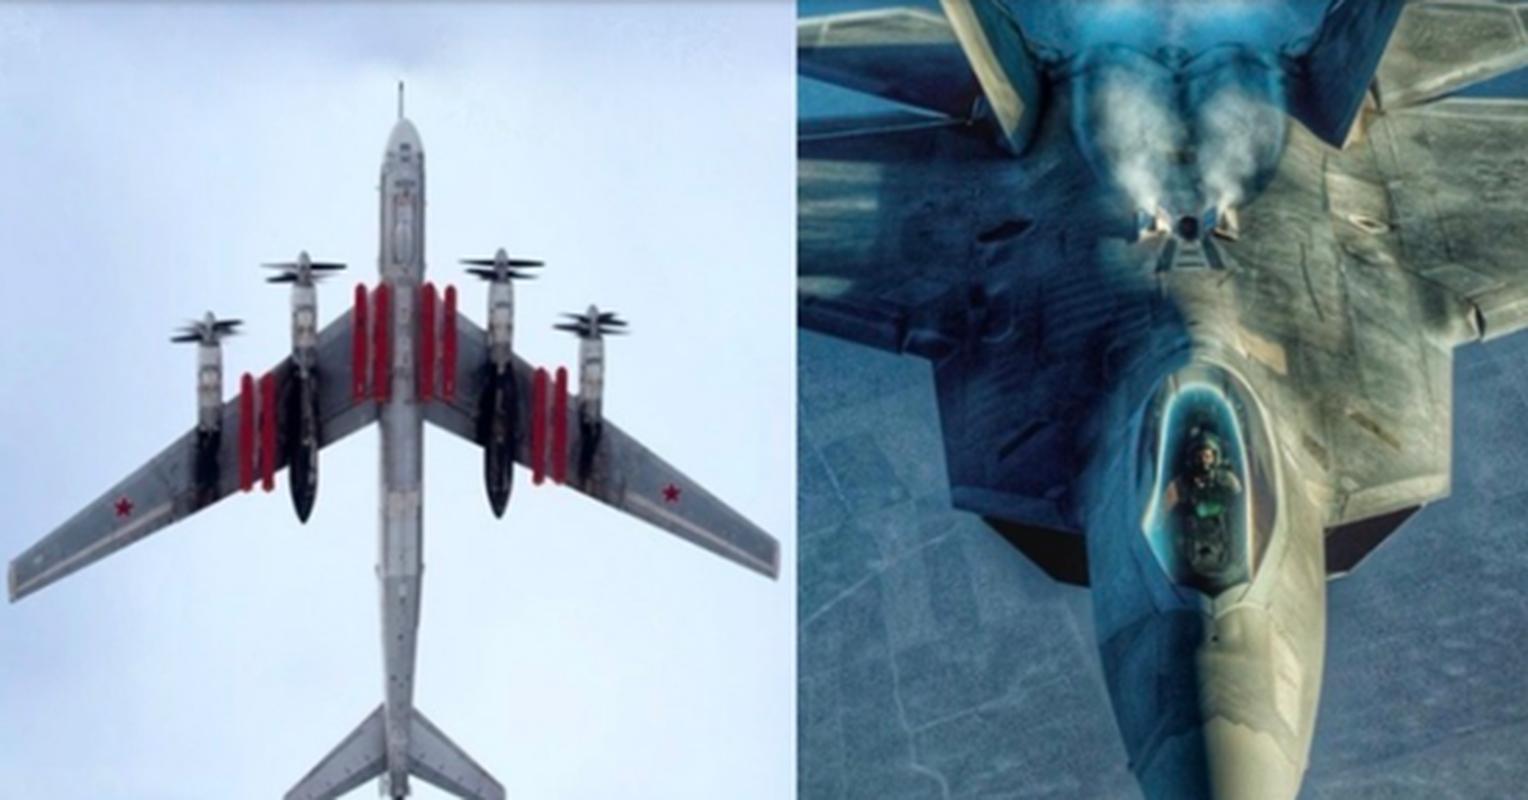 Cach Nga dung may bay doi cu hanh ha F-22 Raptor dat do My-Hinh-6